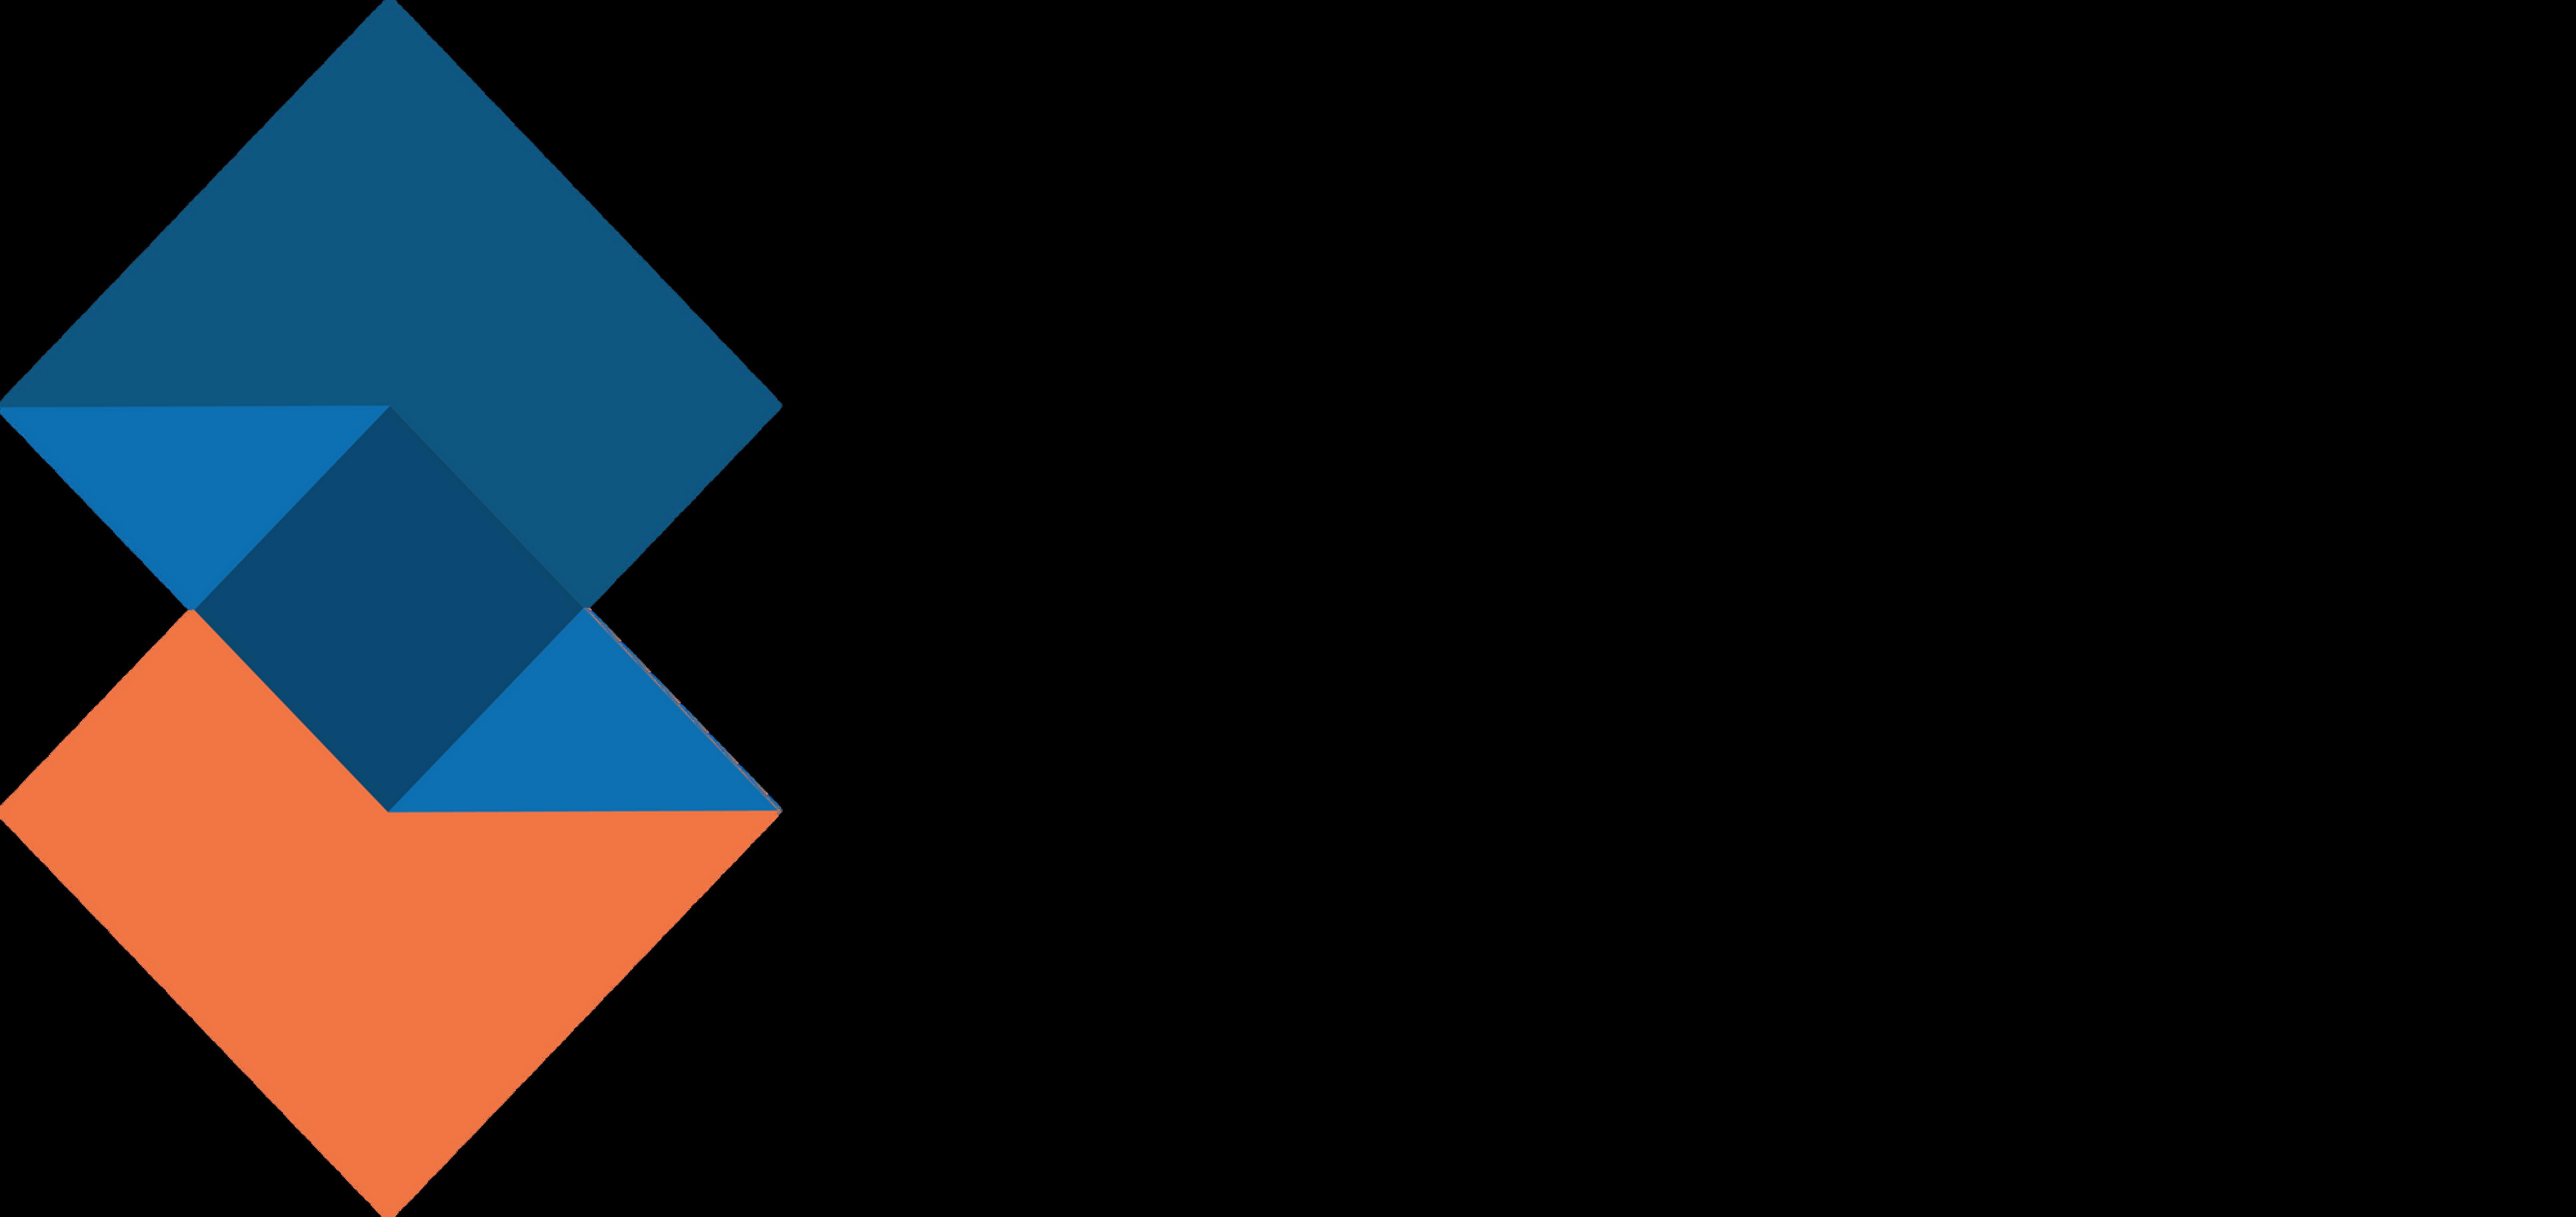 ELF 2018 | Economic and Leadership Forum 2019